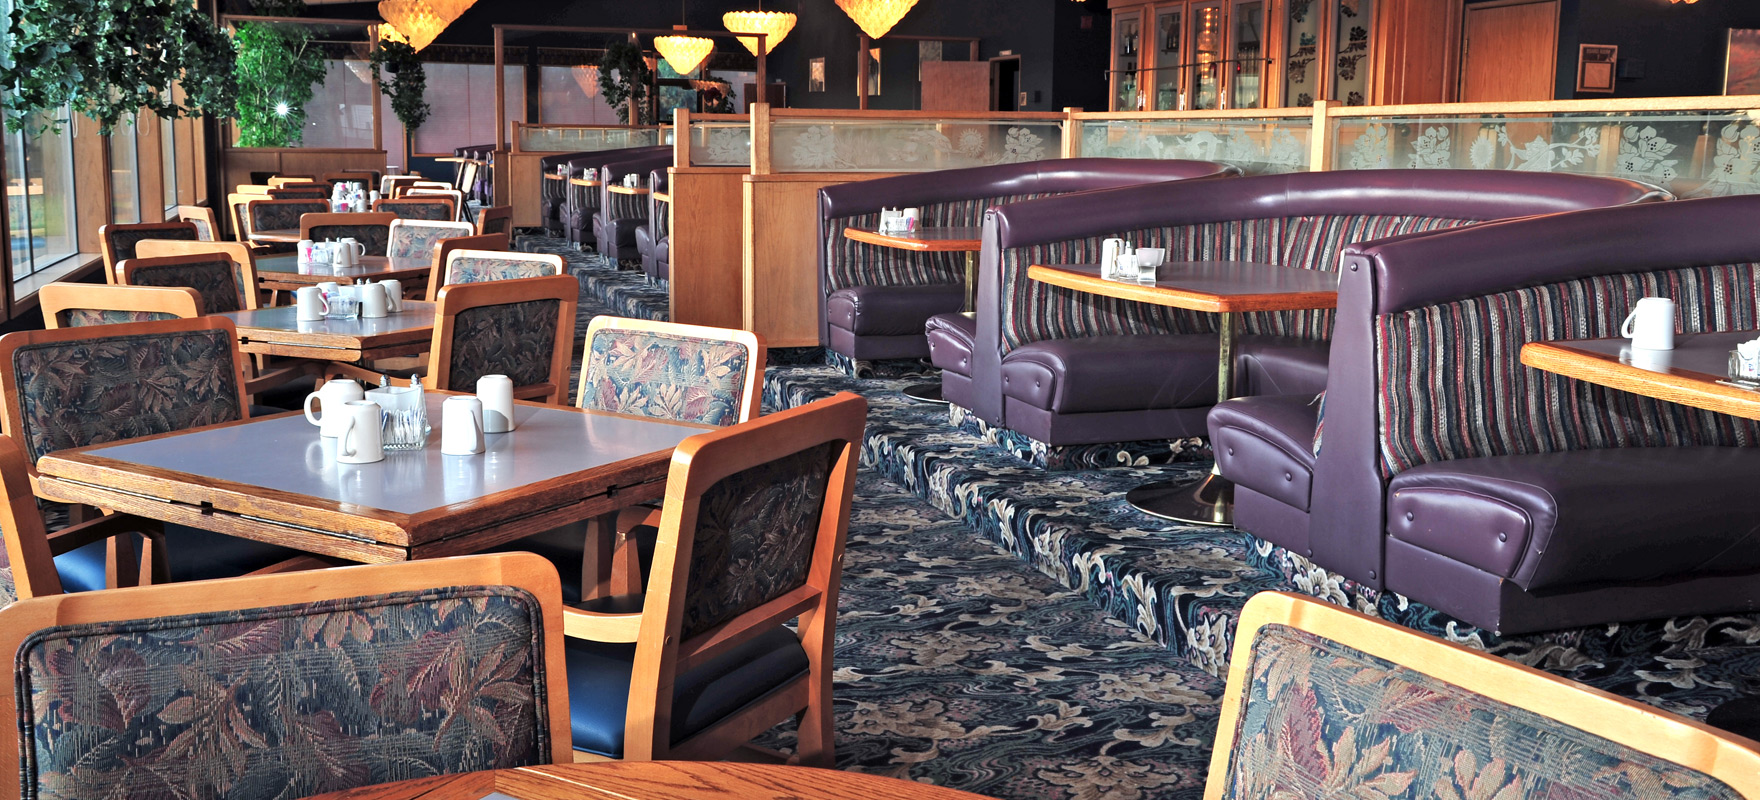 Shilo Inns Suites Hotels Idaho Falls Idaho